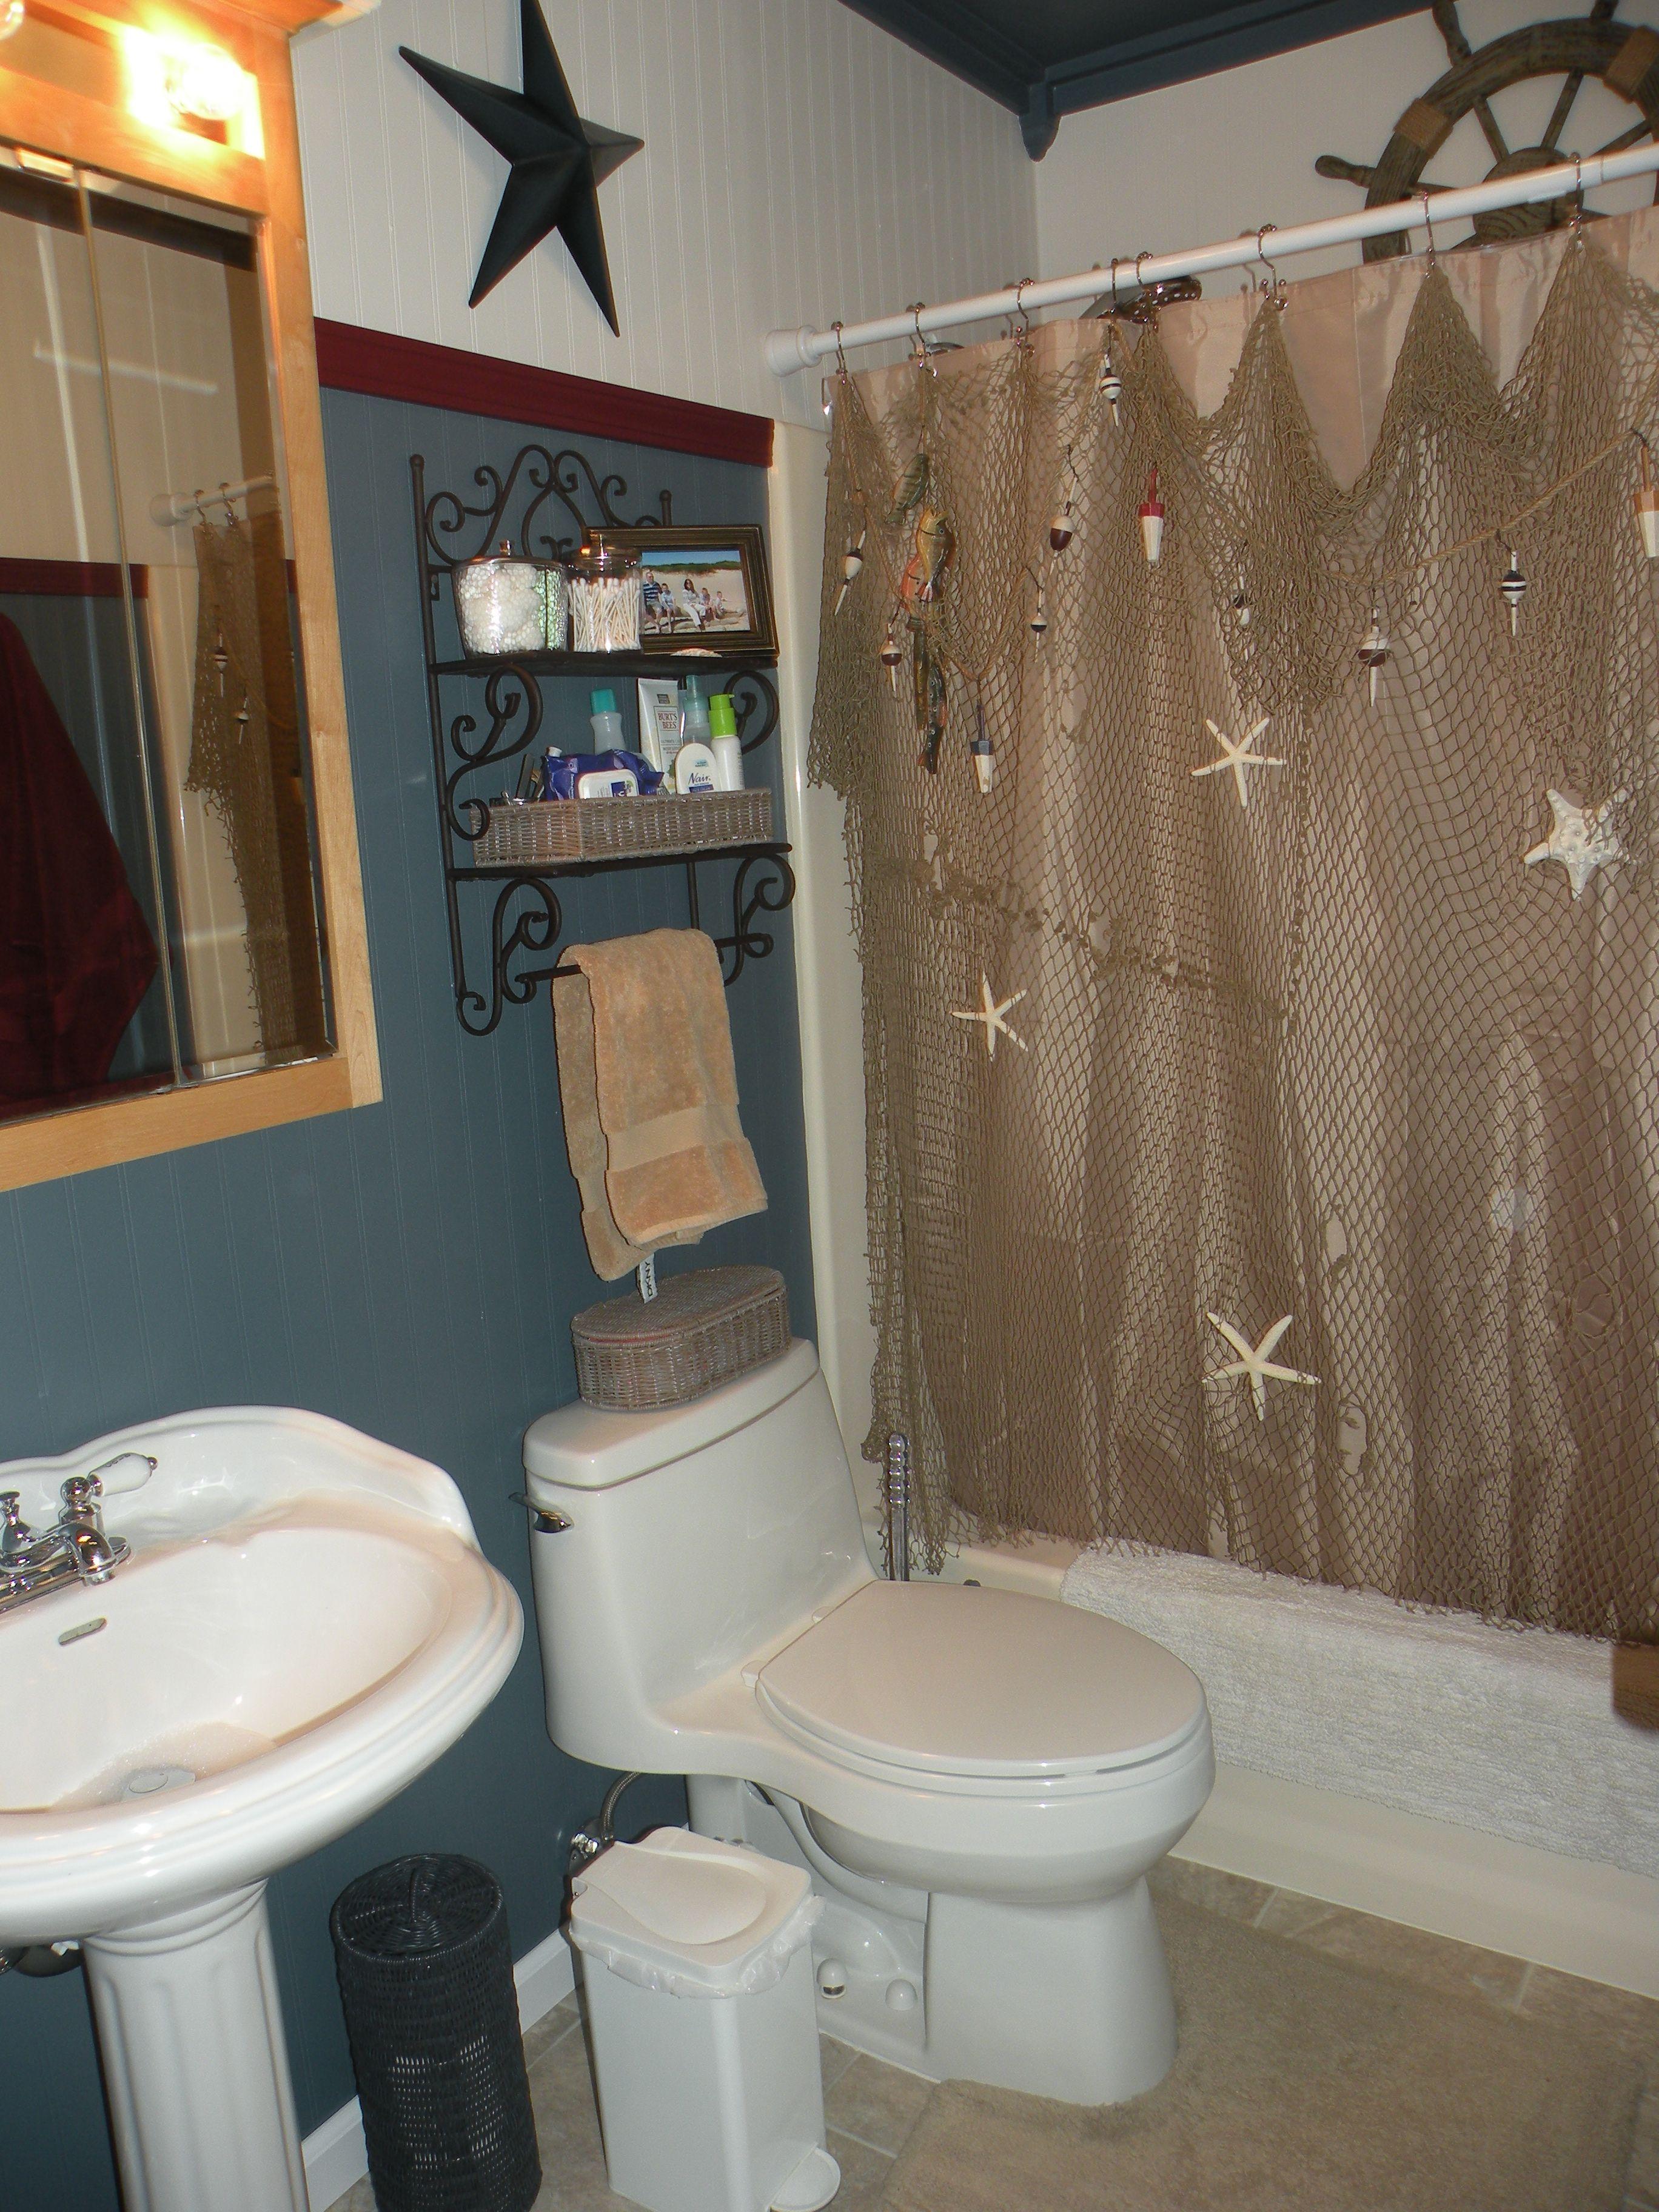 Nautical Bathroom Ideas For The Kids Bath With Images Bathroom